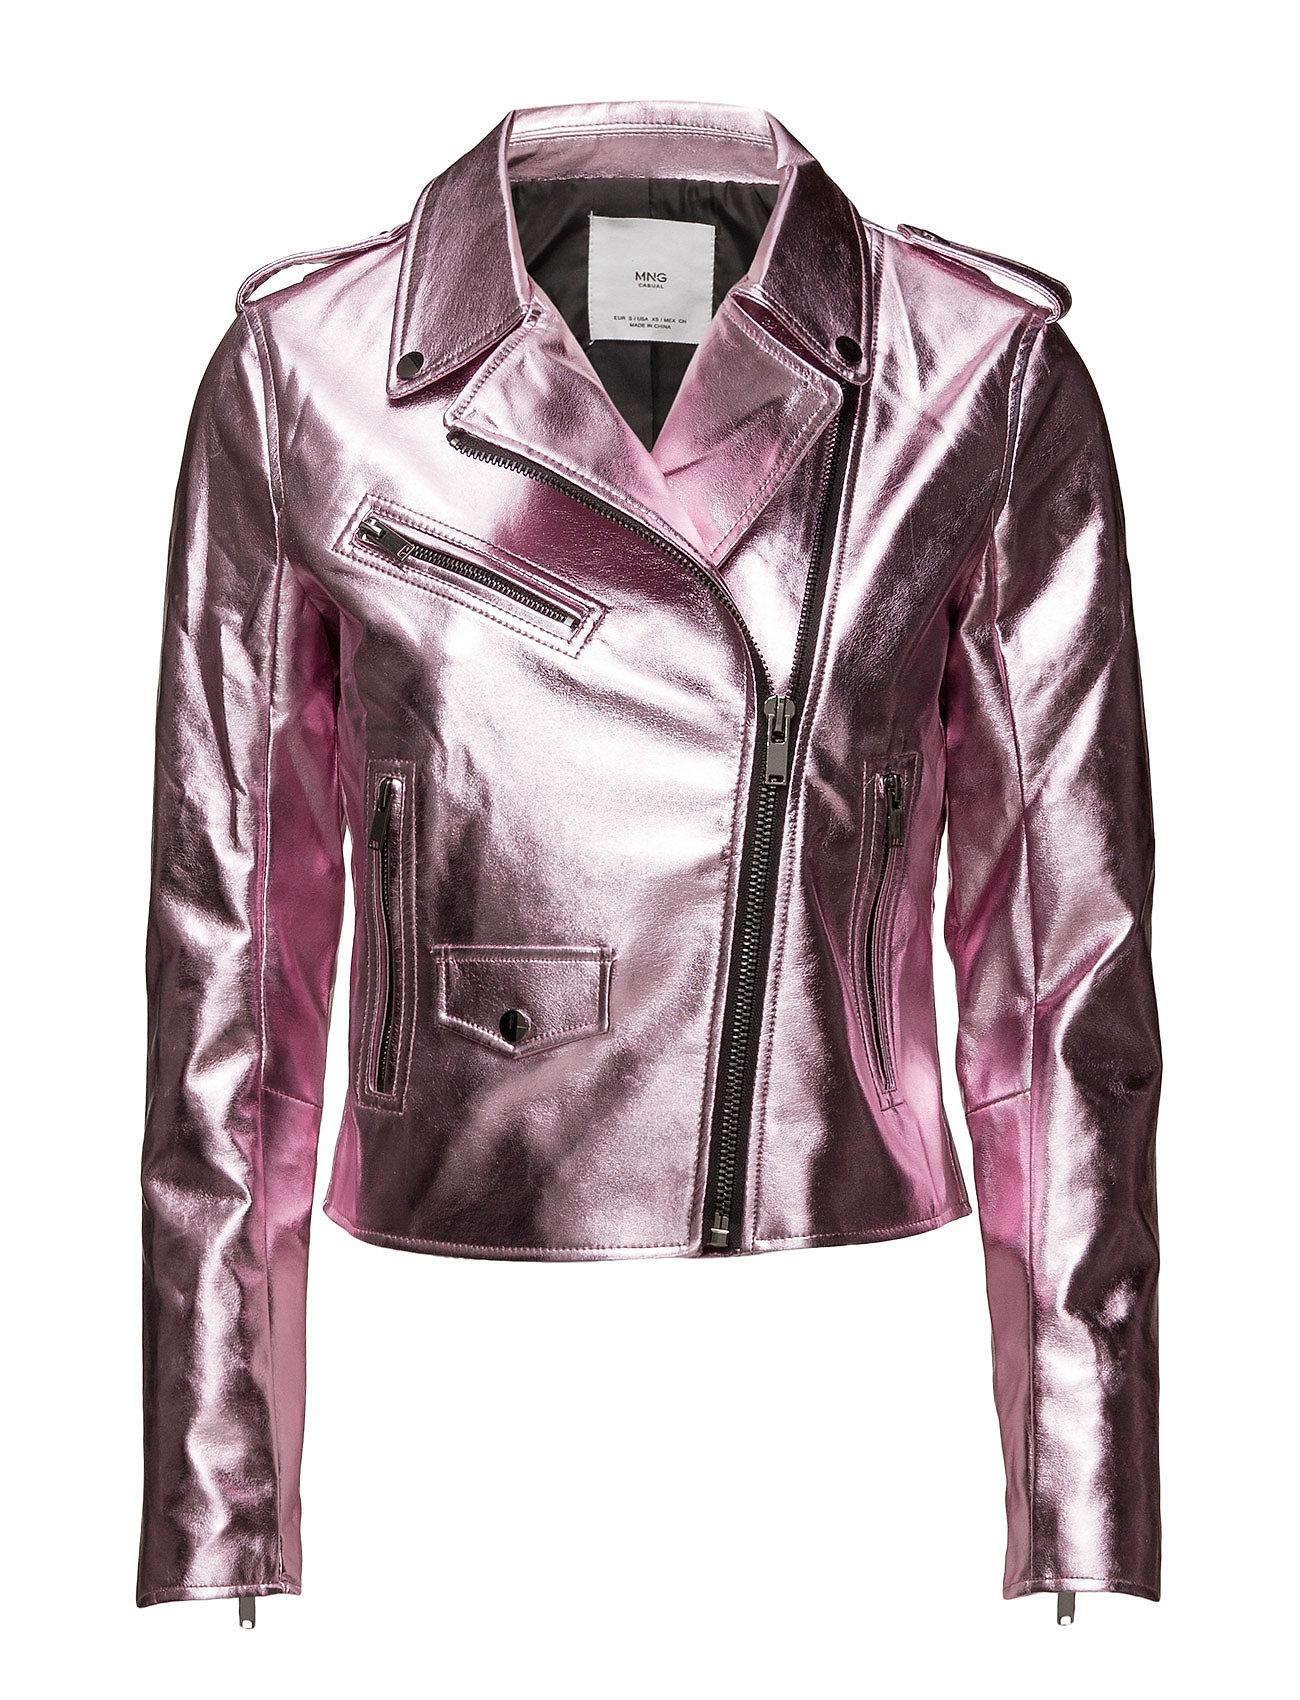 Crystals Metallic Jacket Mango Jakker til Kvinder i Lyserød